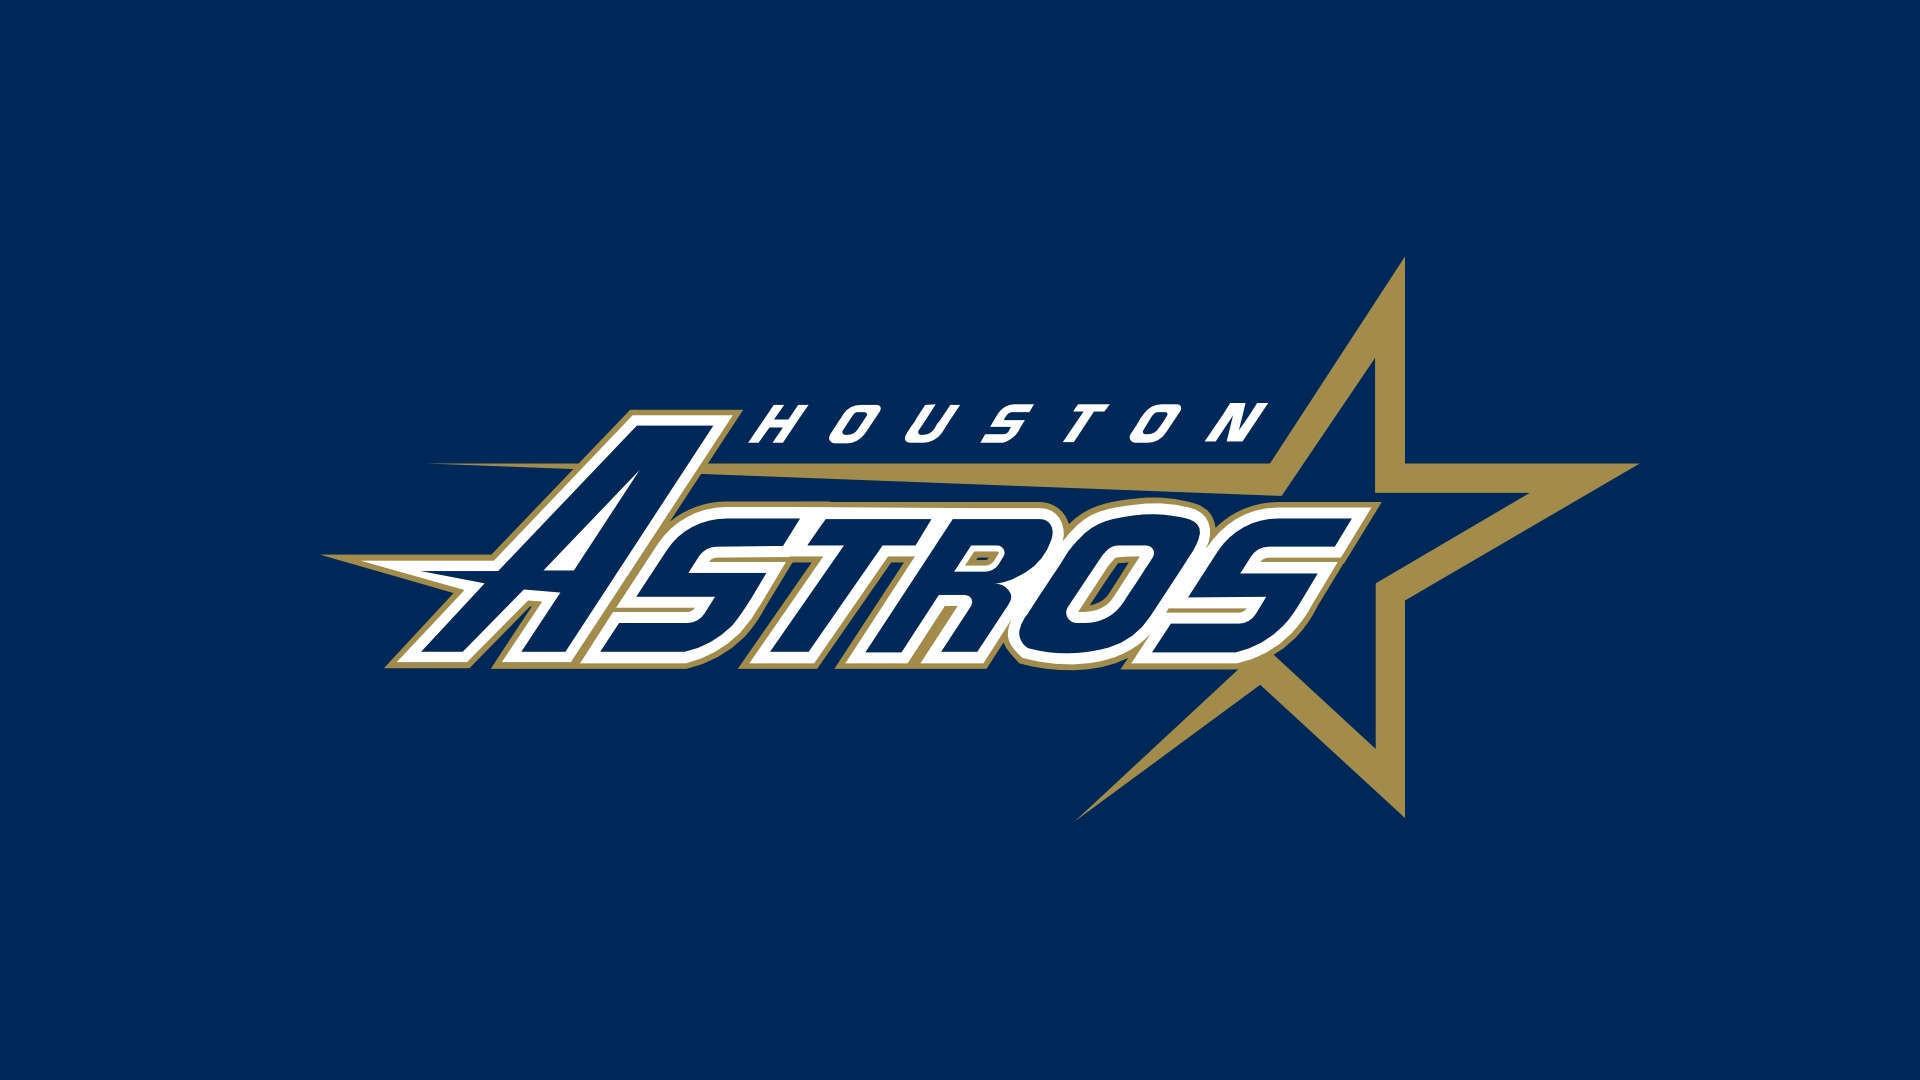 Houston Astros Full HD Images